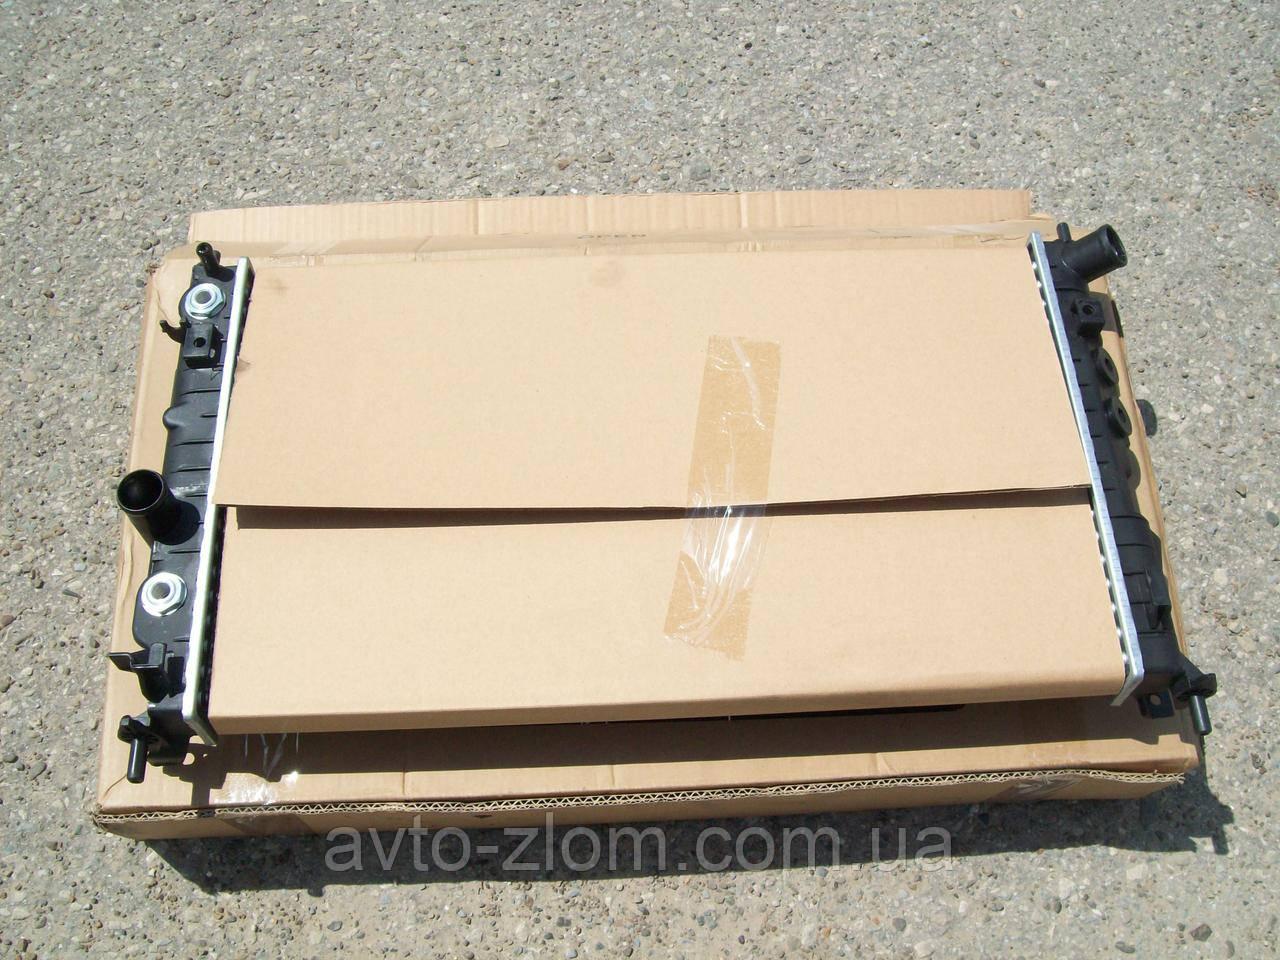 Радиатор Opel Vectra B, Опель Вектра Б 1,6-1,8-2,0 16V. C кондиционером + коробка автомат.